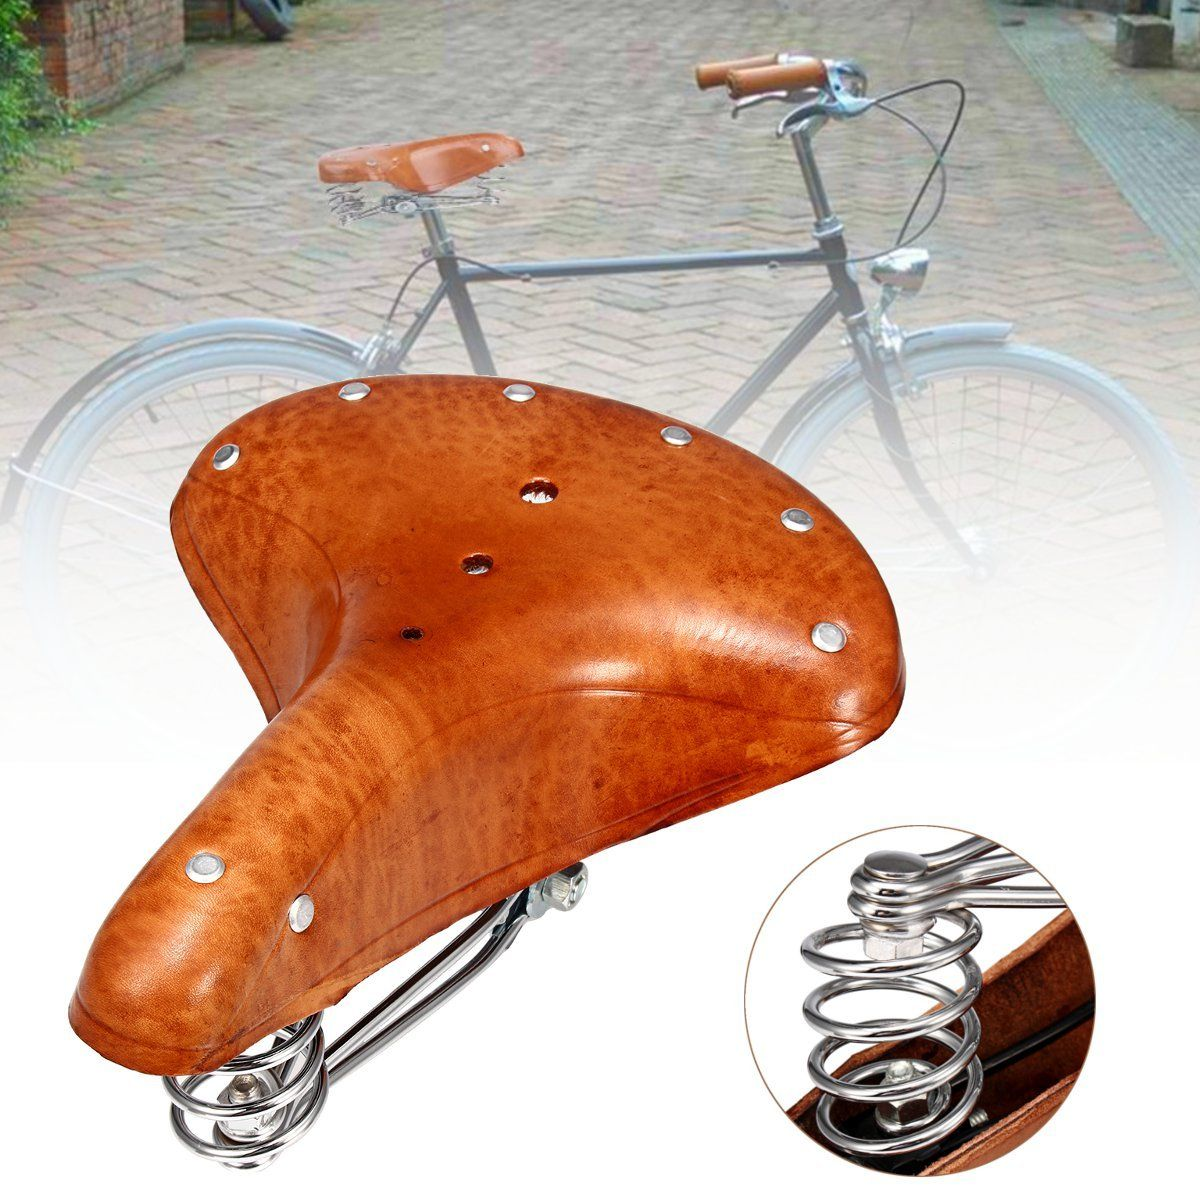 Bikight Genuine Leather Cycling Bicycle Saddle Seat Comfortable